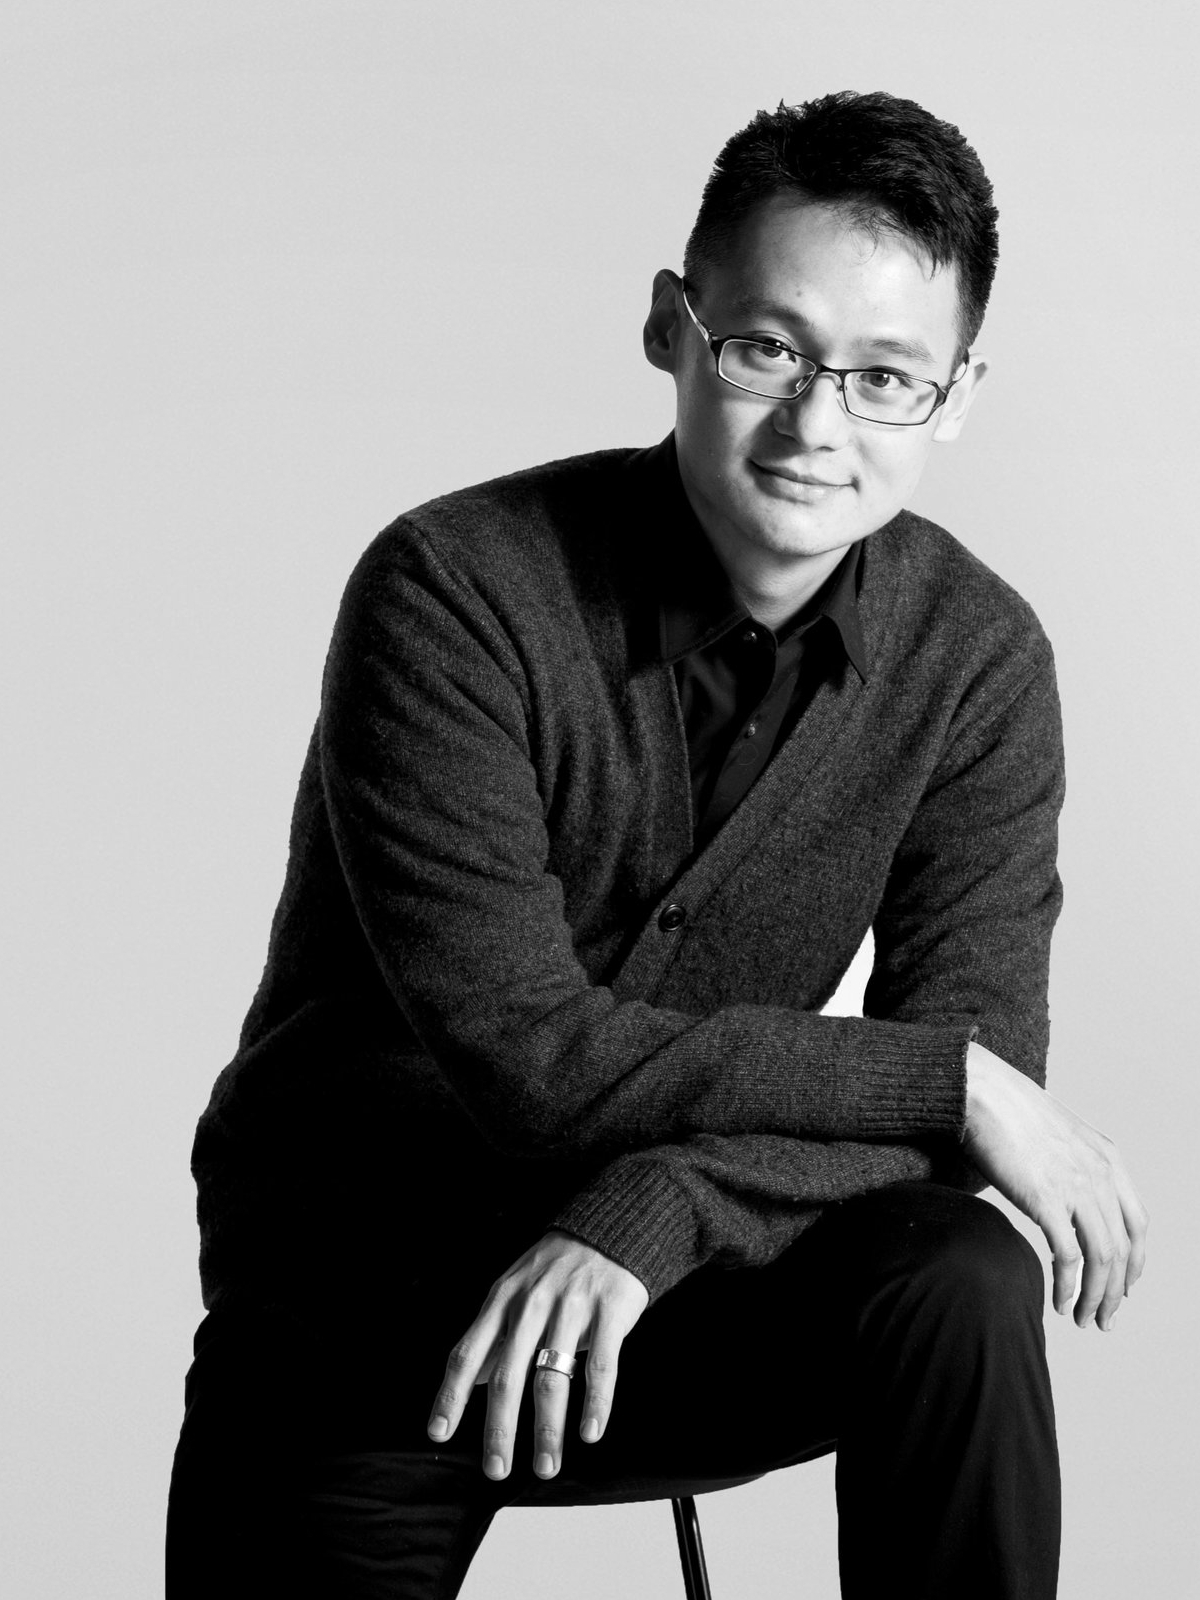 MATTHEW CHANG Software Engineer